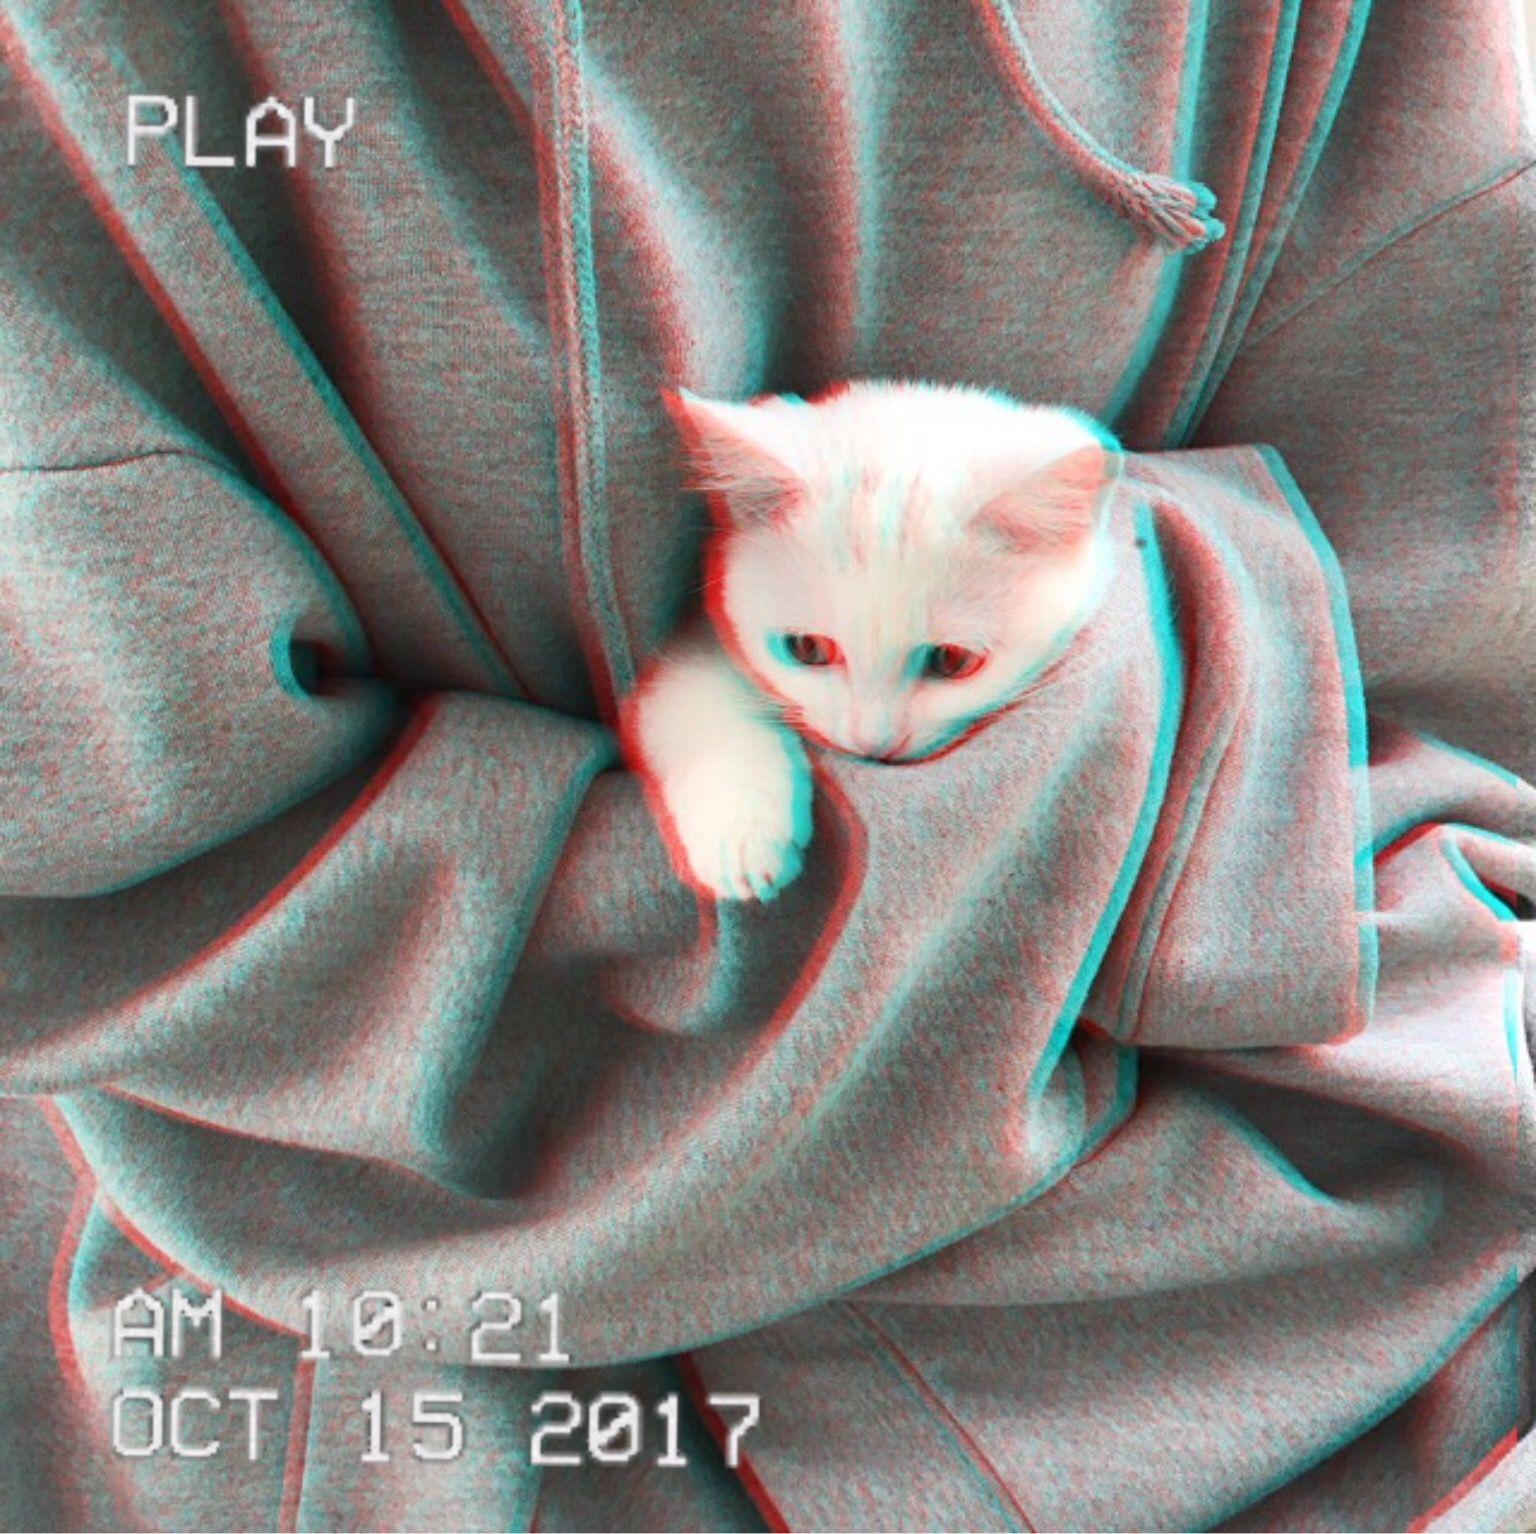 ᴘɪɴᴛᴇʀᴇsᴛ ʟᴜɴᴀᴛɪᴄᴇᴇᴇ Fotos de gatos fofos, Gatinhos